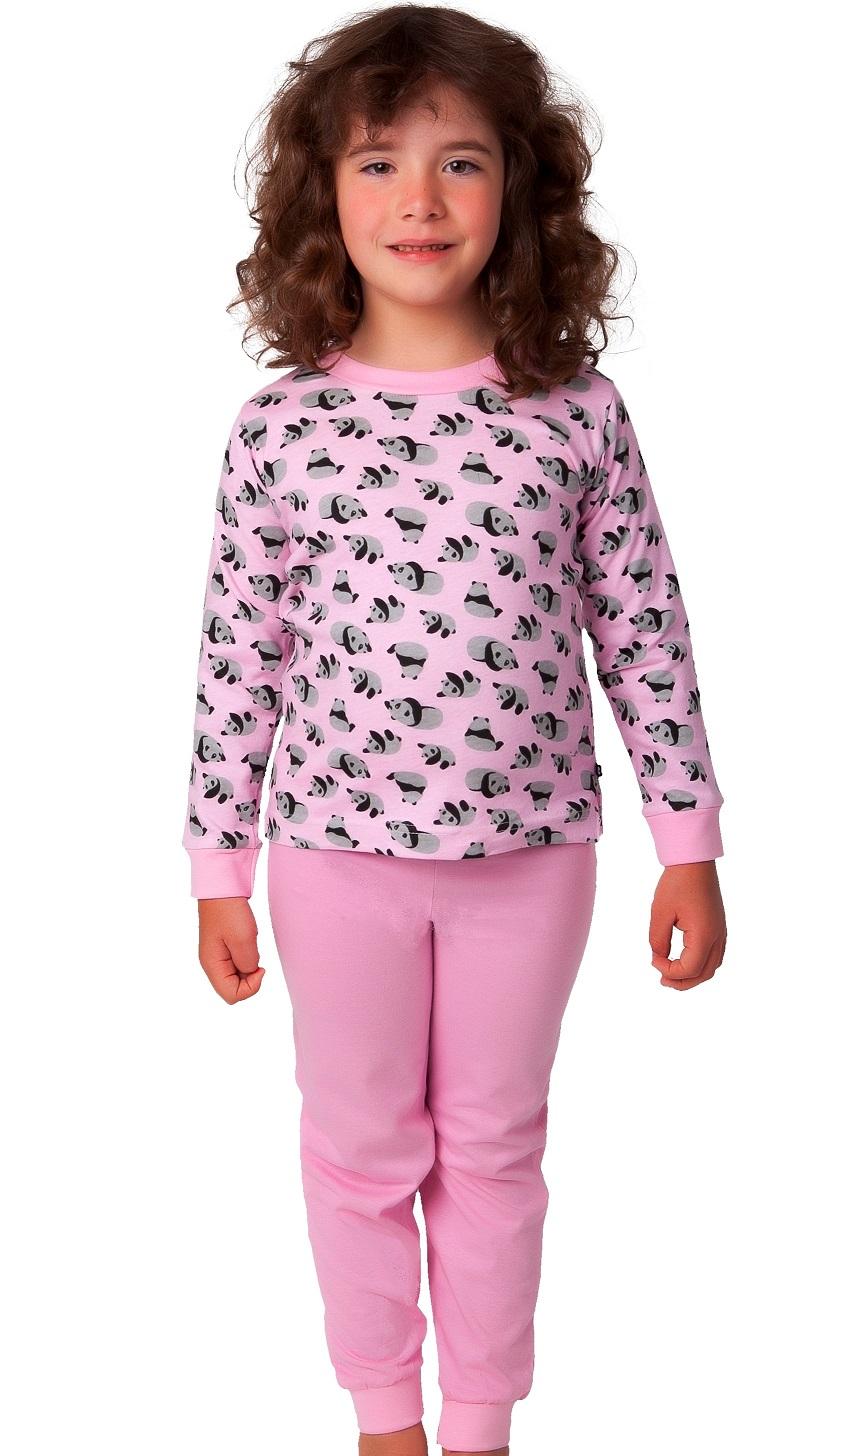 Pyžamo pro holky Panda 1F0534